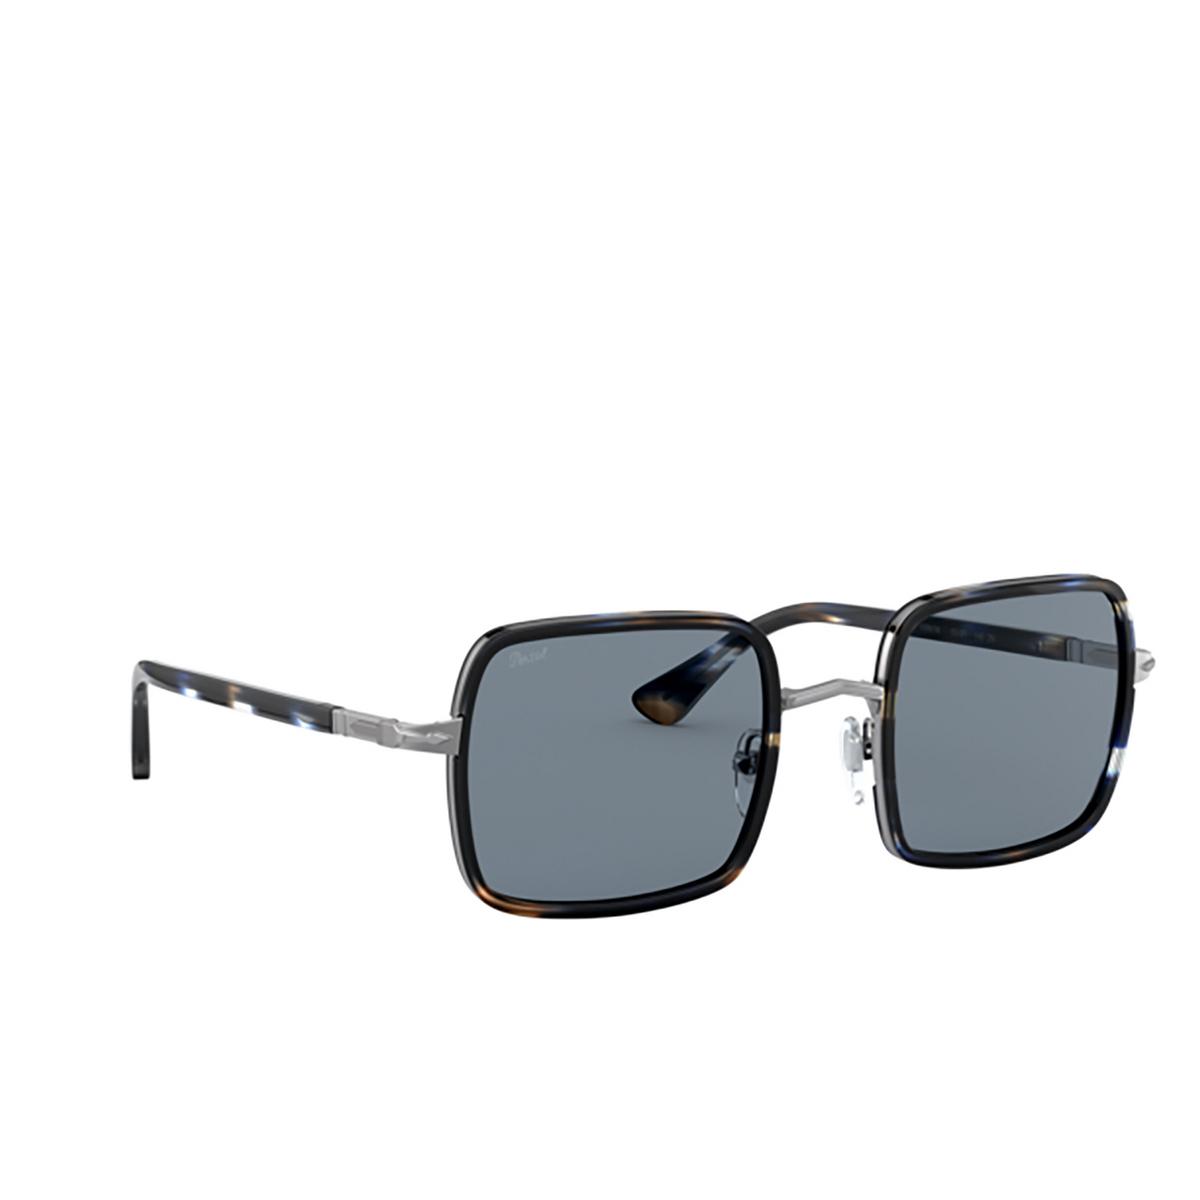 Persol® Square Sunglasses: PO2475S color Gunmetal & Blue Grid 109956 - three-quarters view.